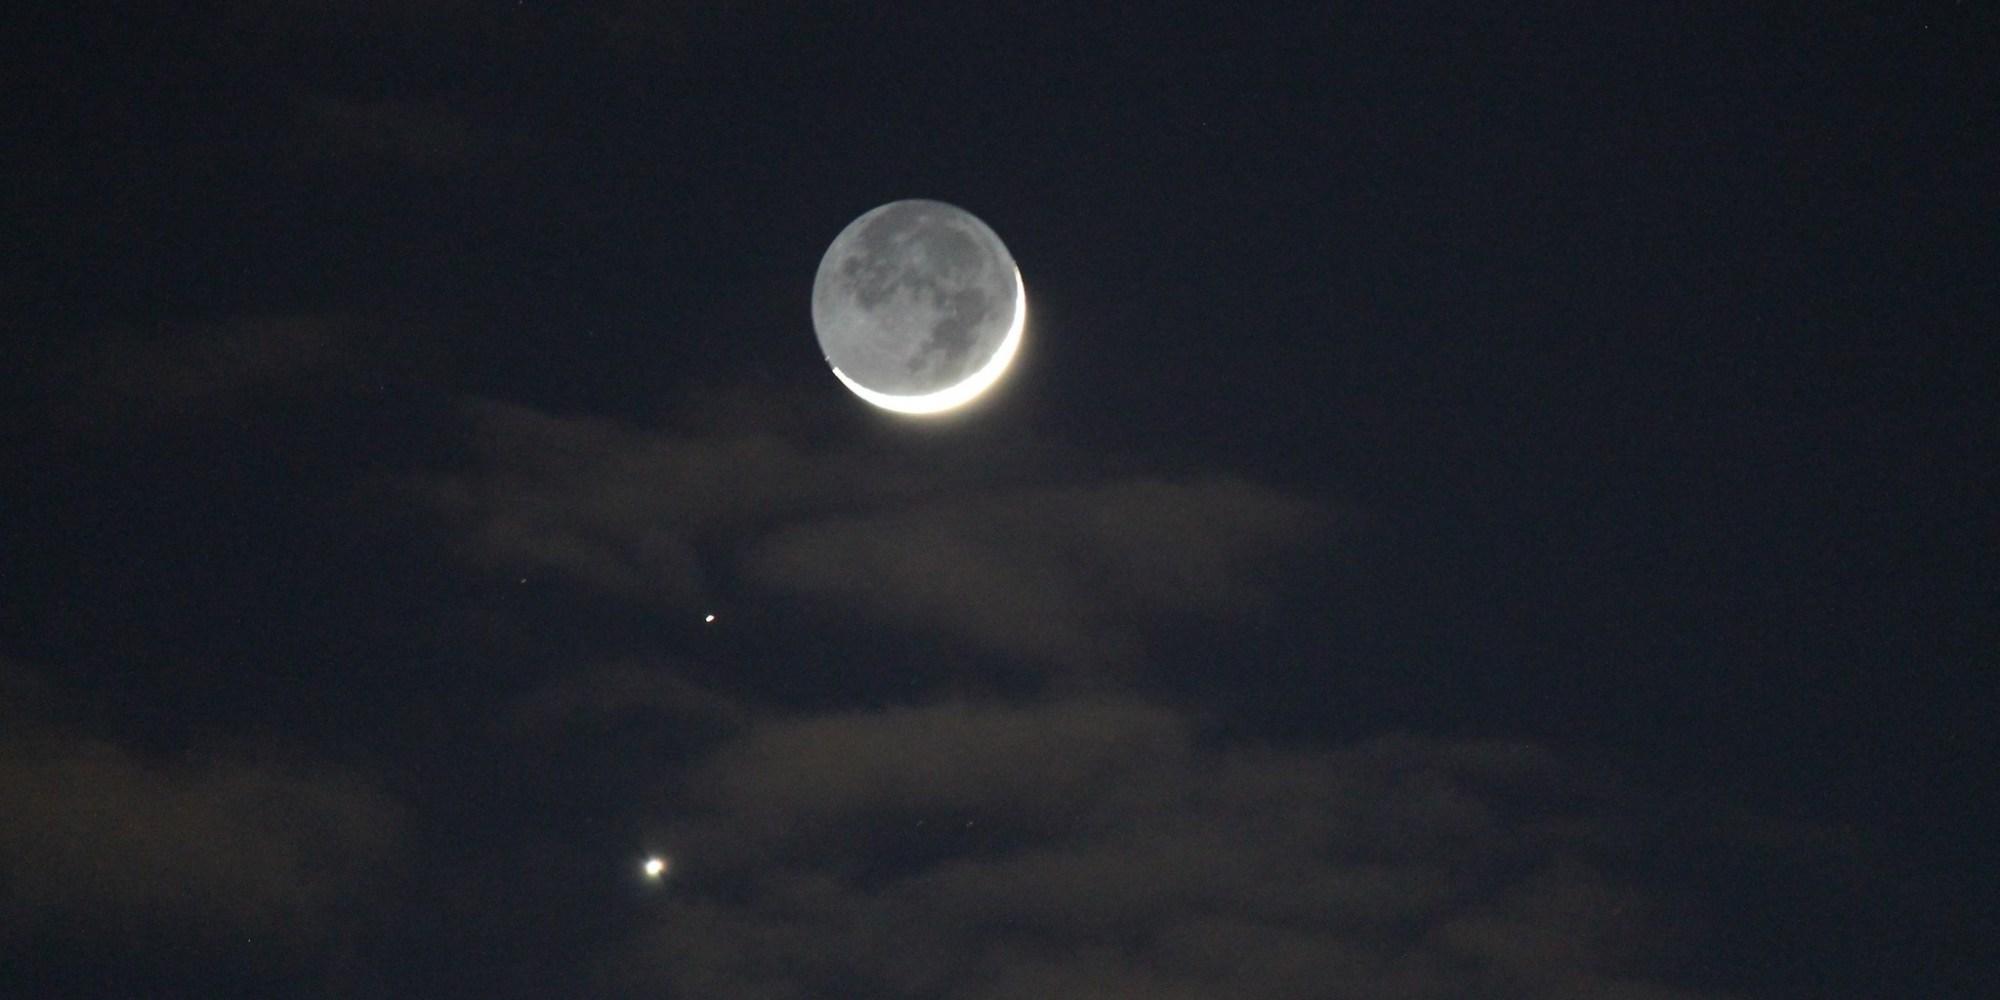 mars venus moon conjunction photos - photo #30